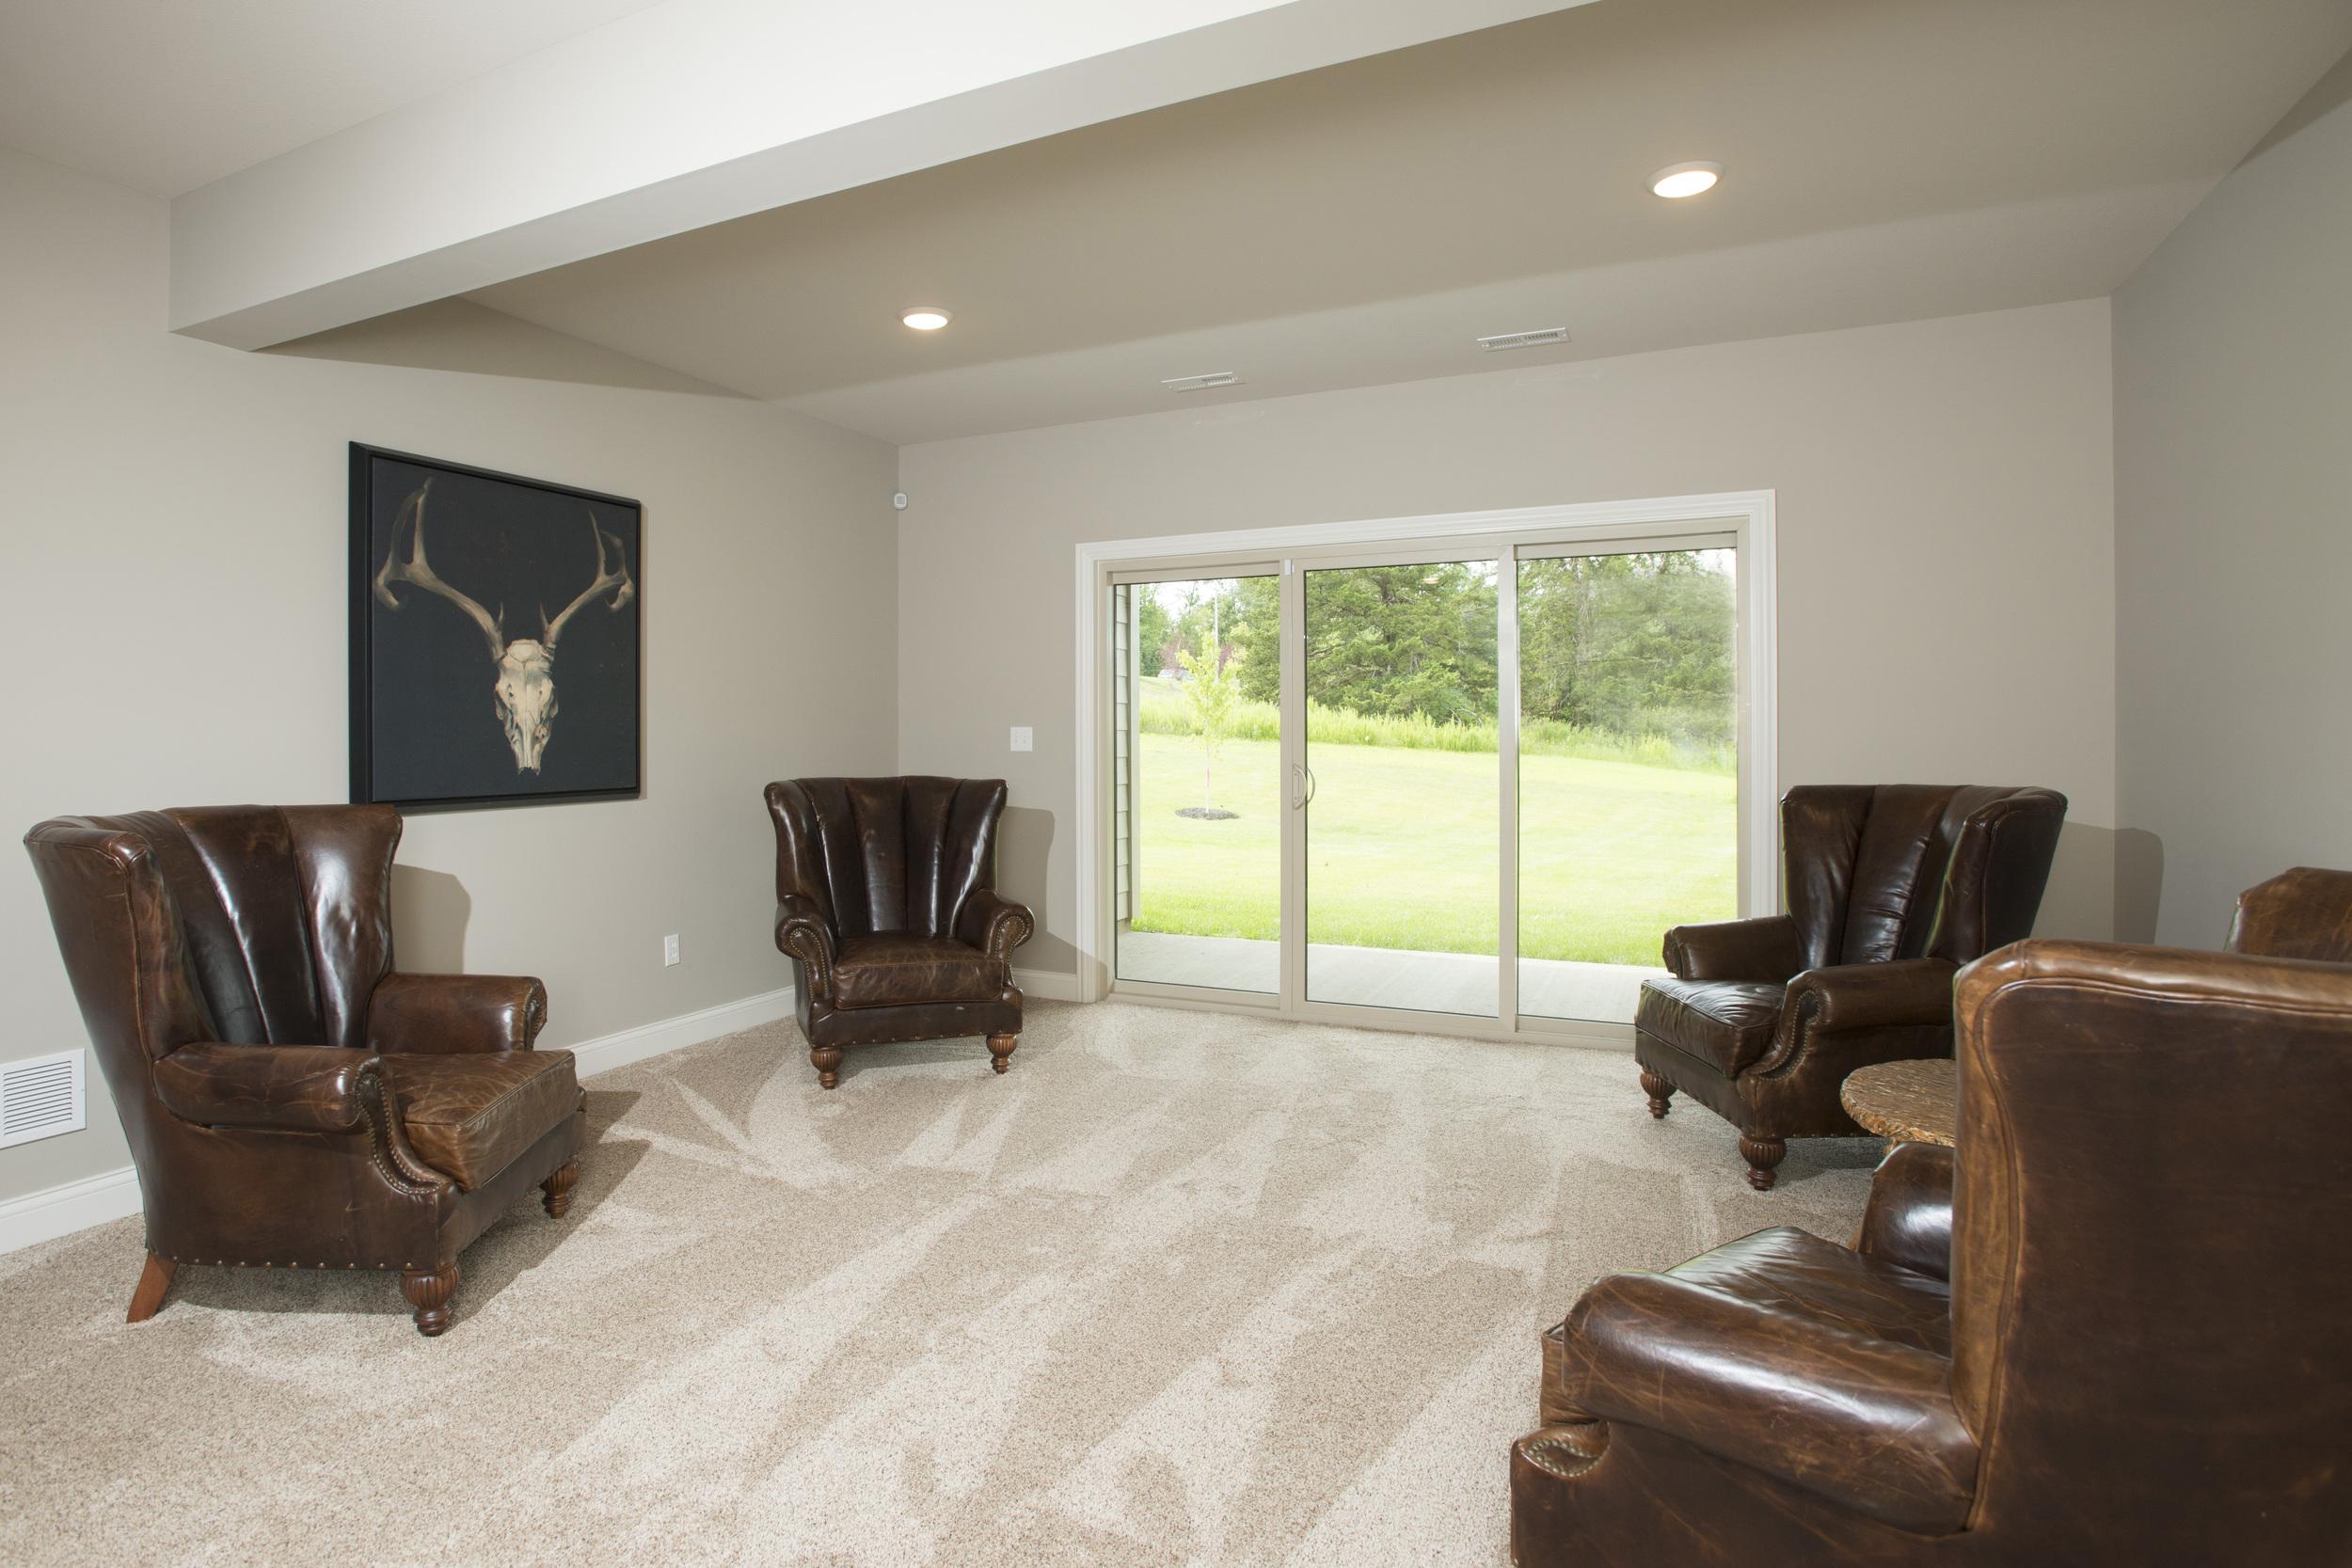 1100-shallow-ridge-new-home-for-sale-columbia-mo-girard-homes